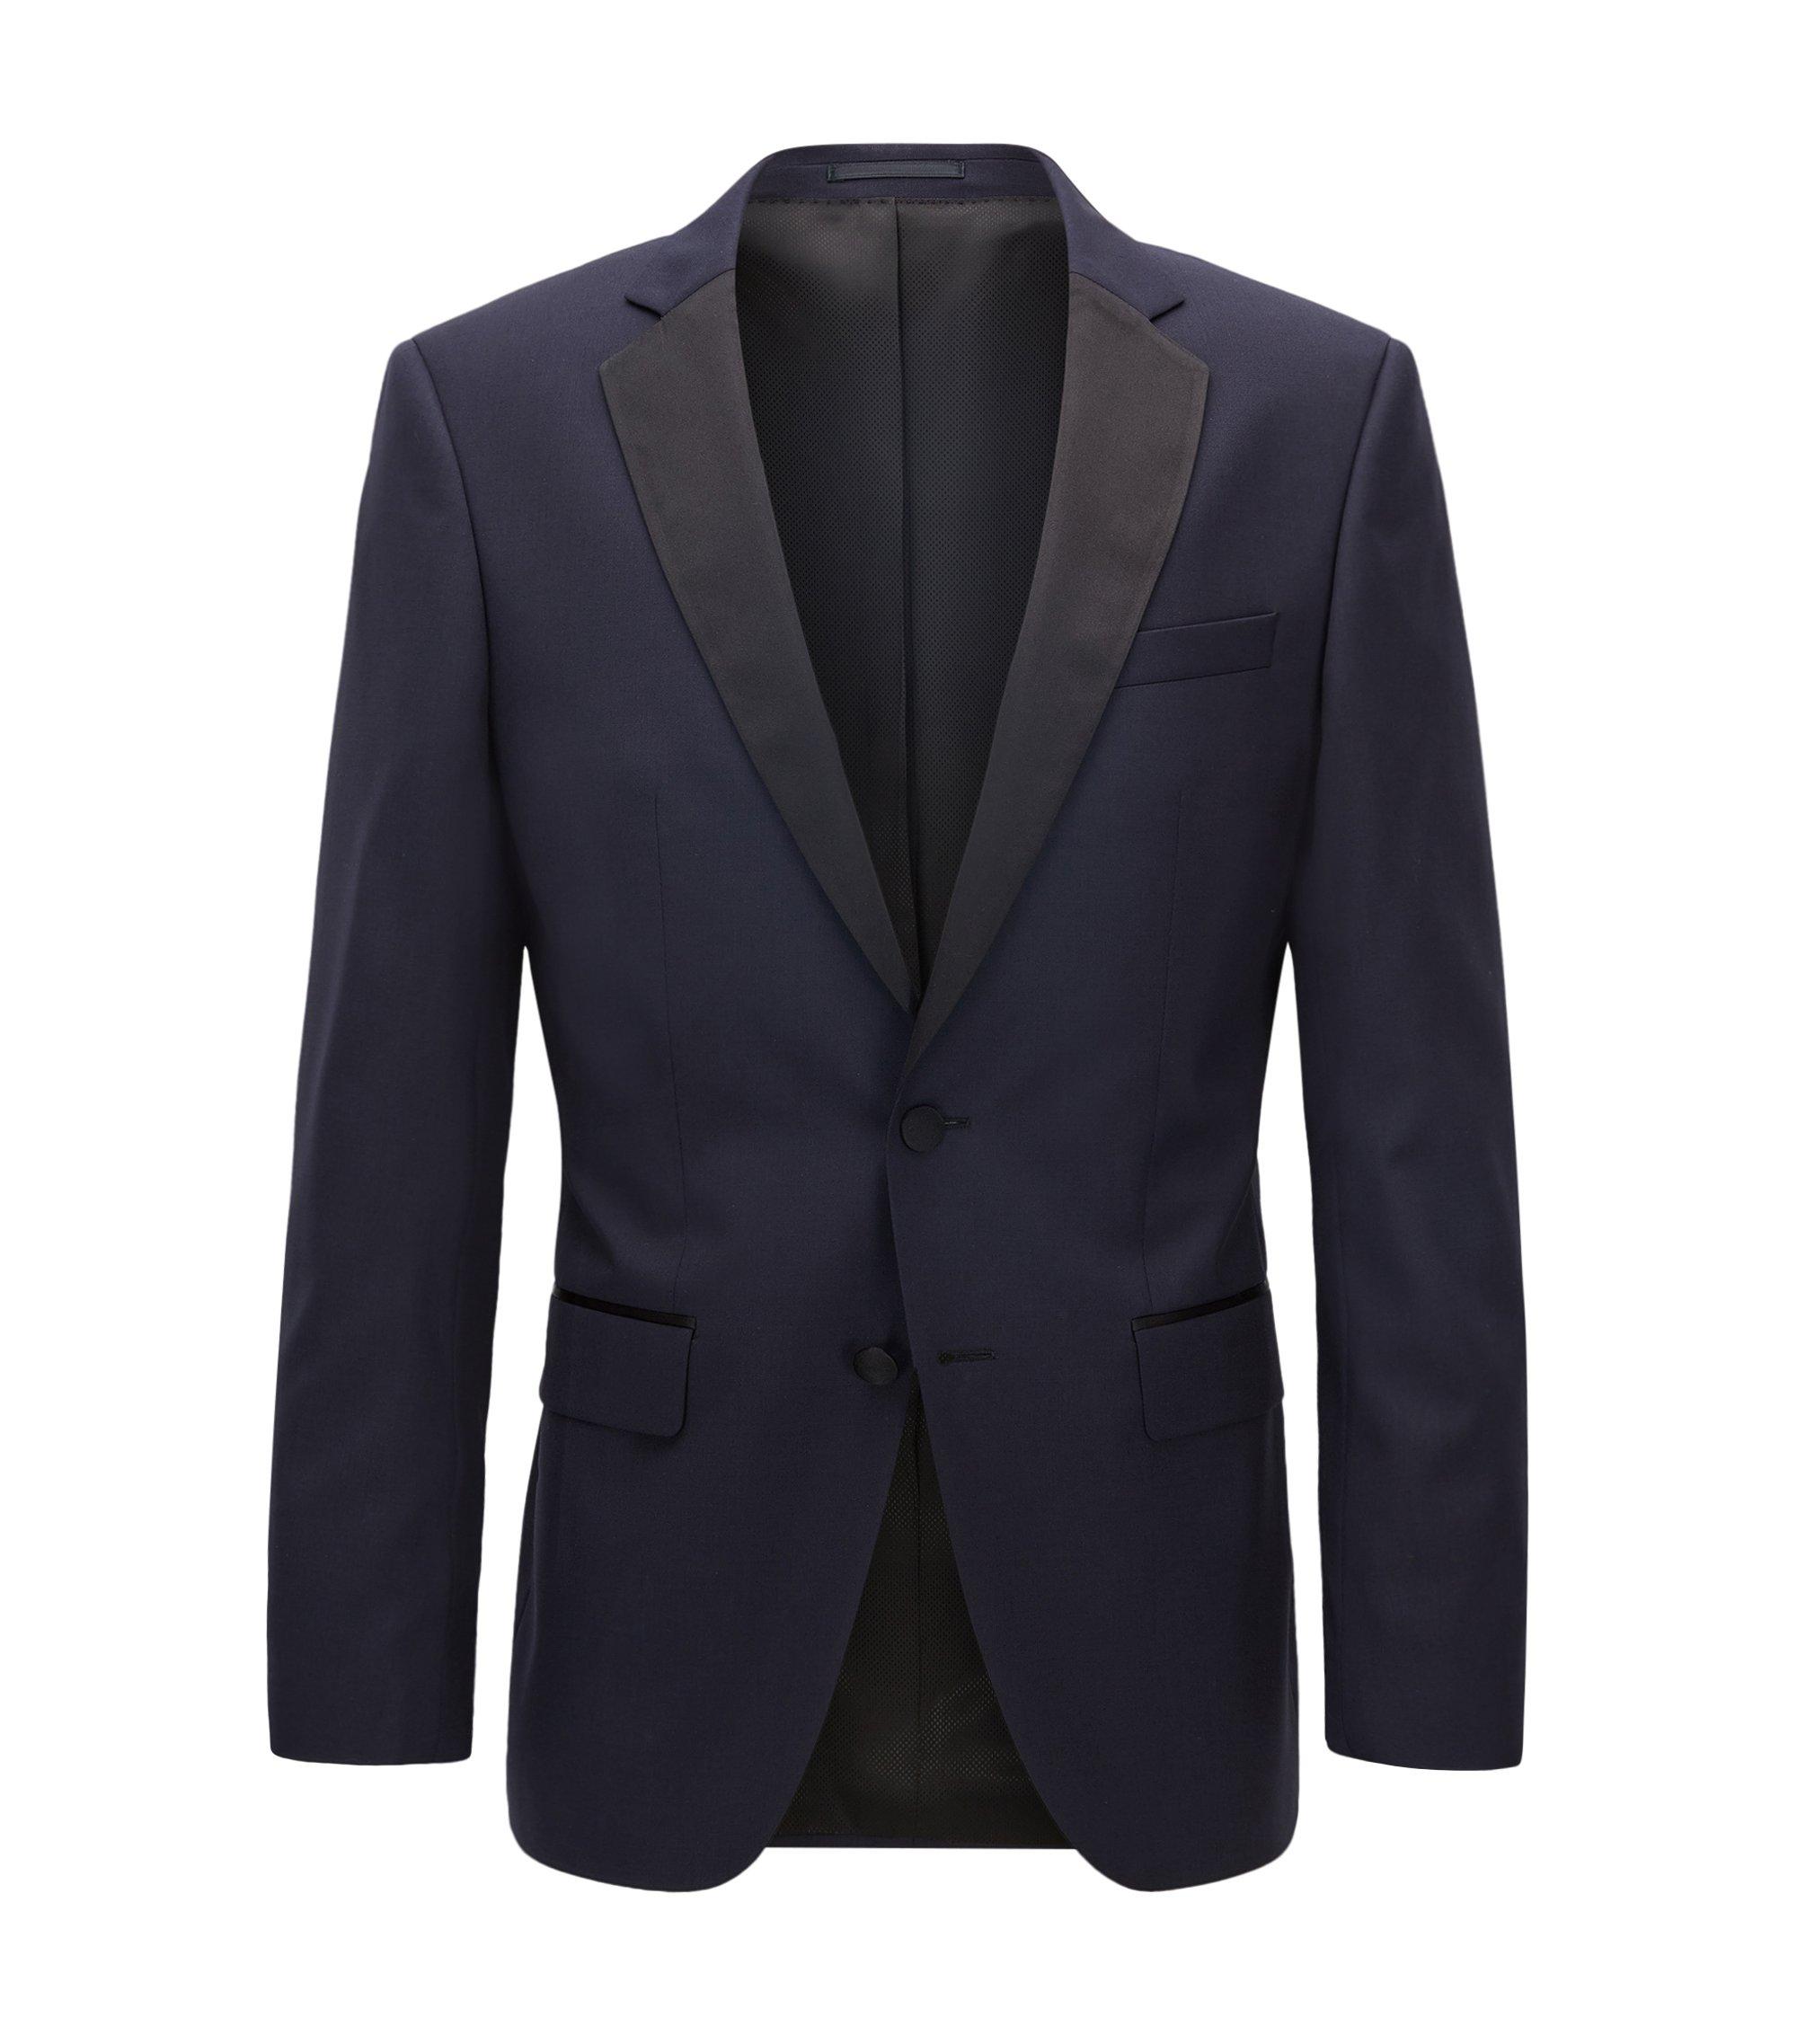 Giacca slim fit in lana vergine con dettagli in seta, Blu scuro